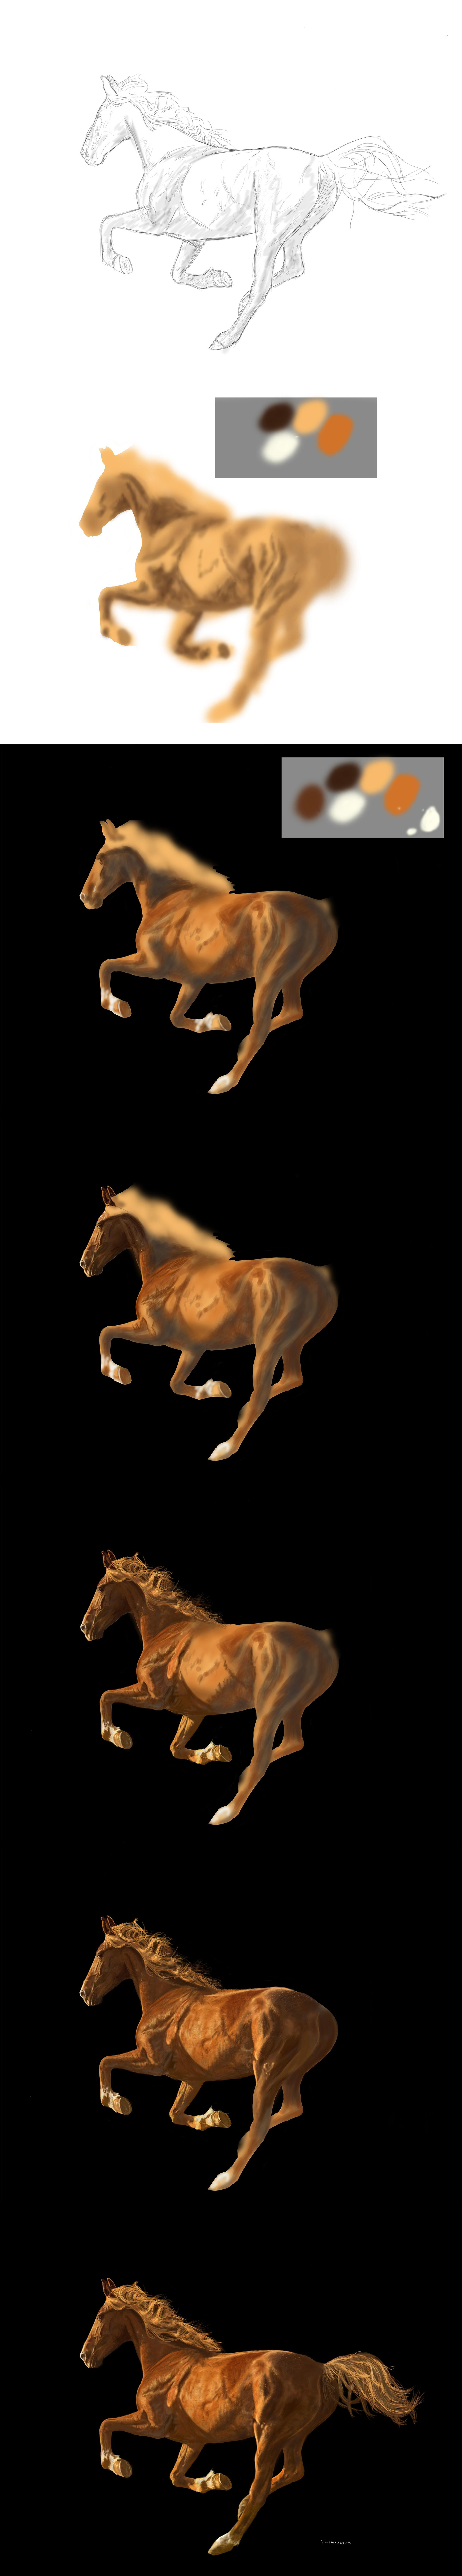 horse_work_in_progress_goran_ognjanovic.jpg